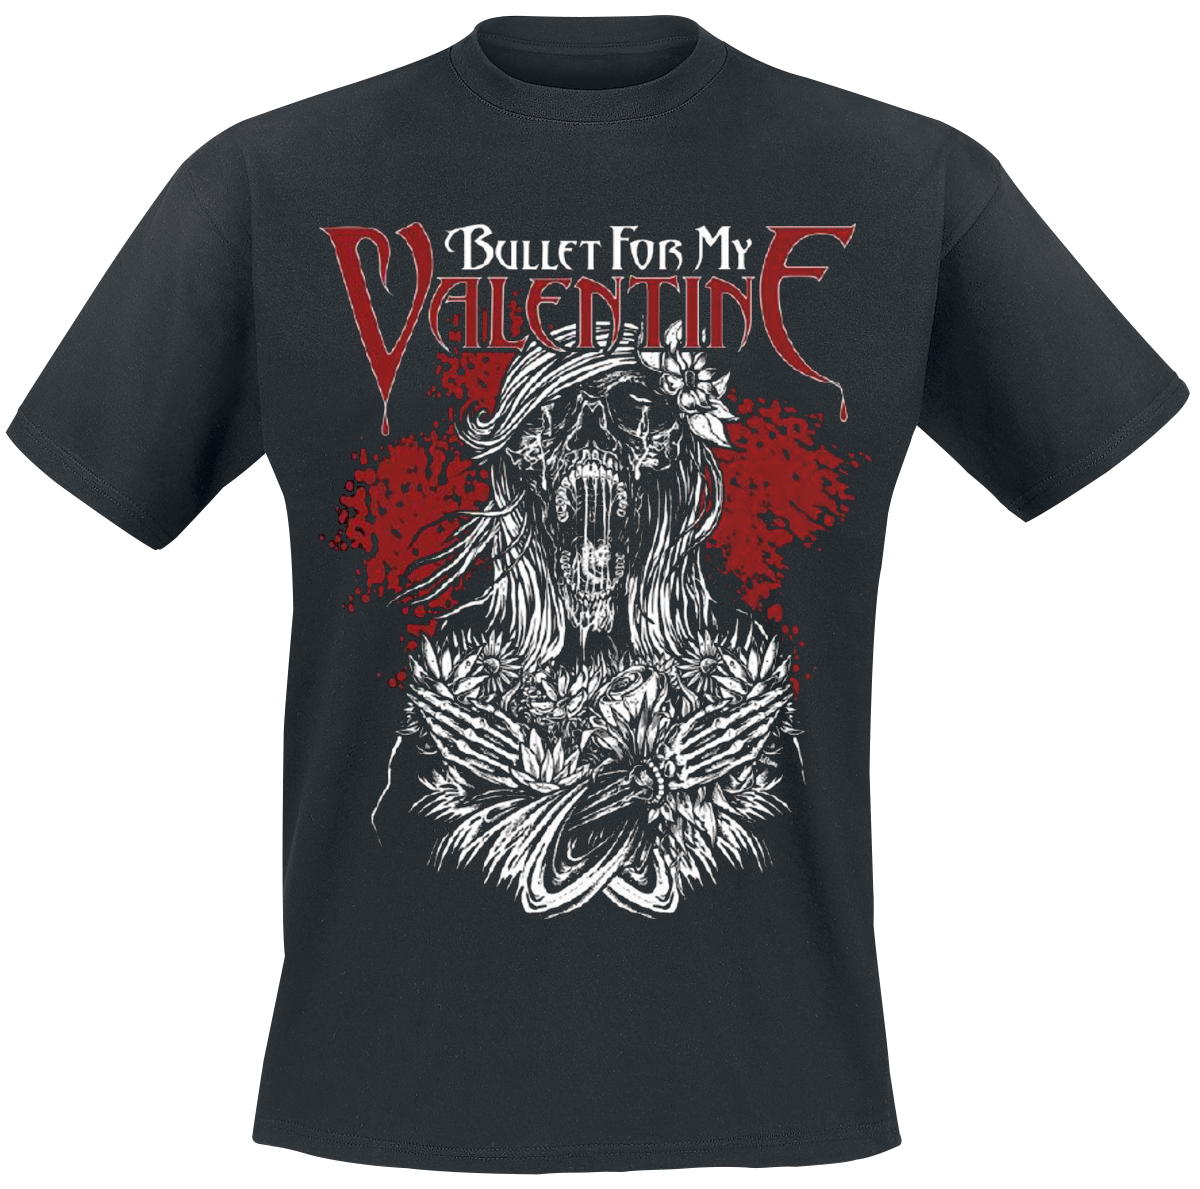 Bullet For My Valentine - Bats Attack - T-Shirt - black image